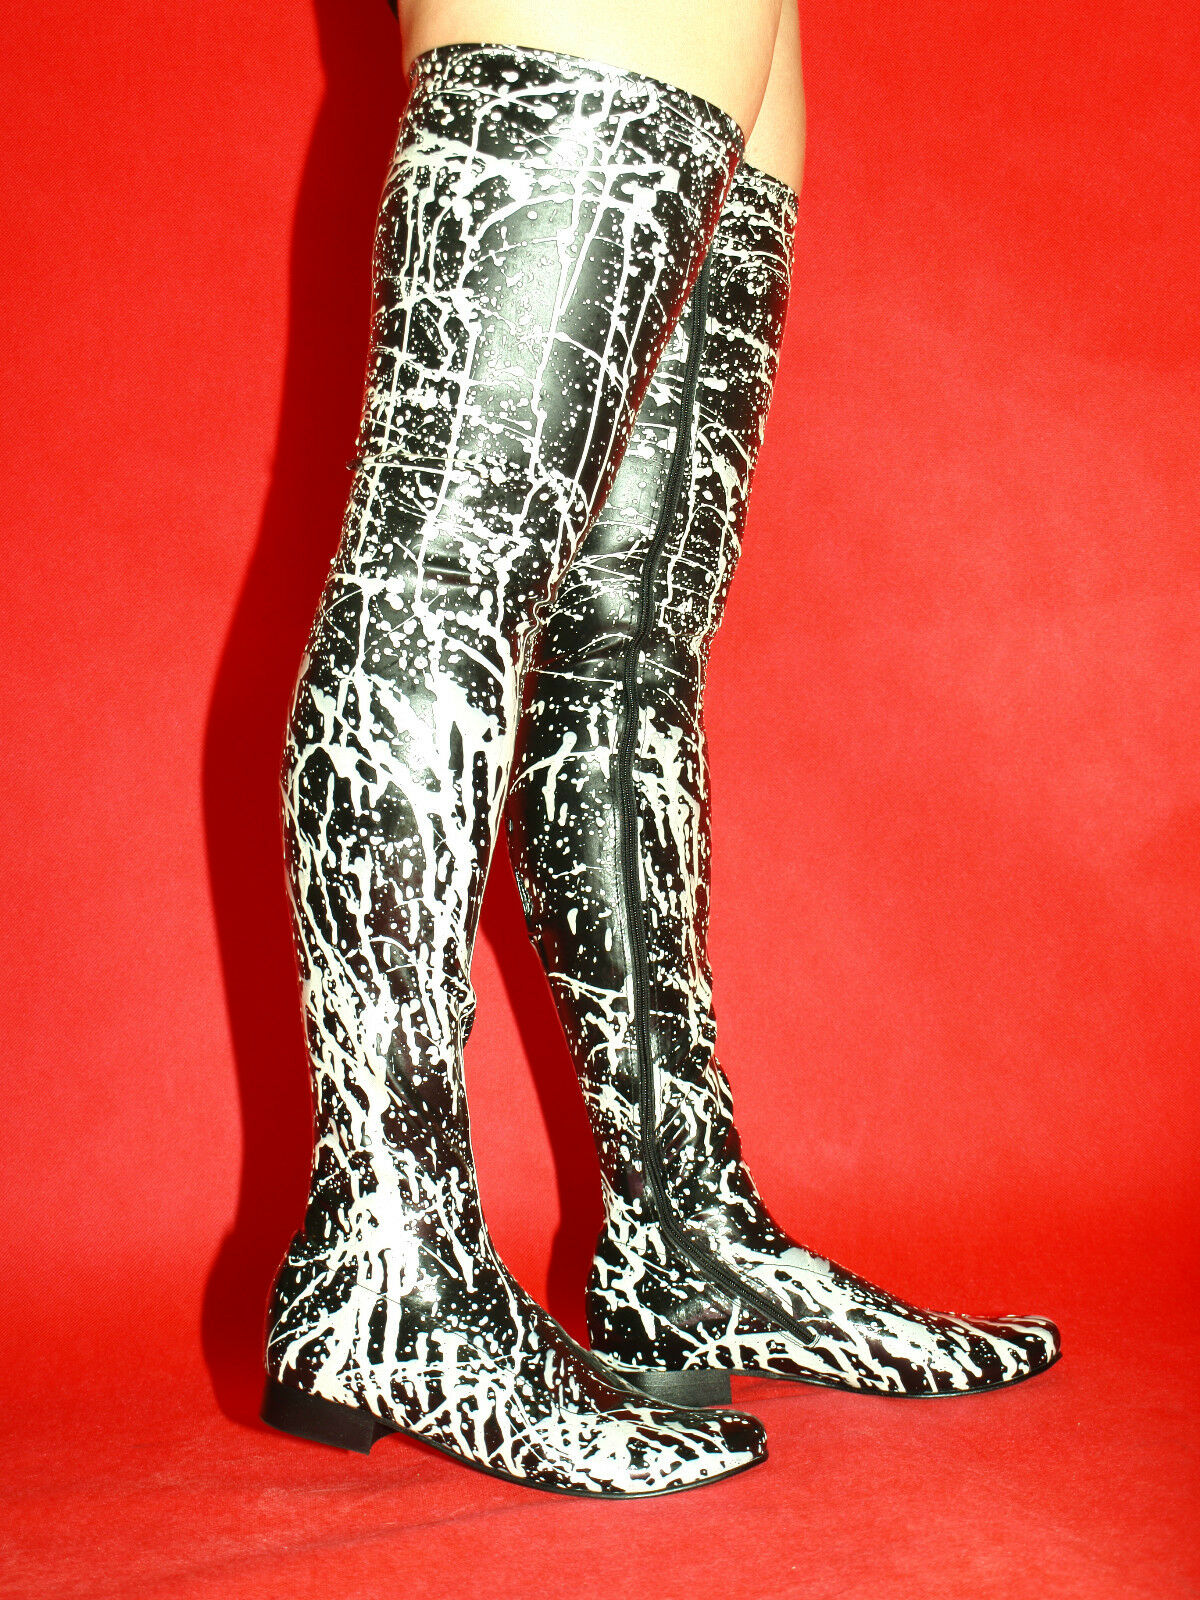 High heels, latex gummi 36 37 38 39 40 41 42 43 44 45 46 47 48 Bolingier FS1200